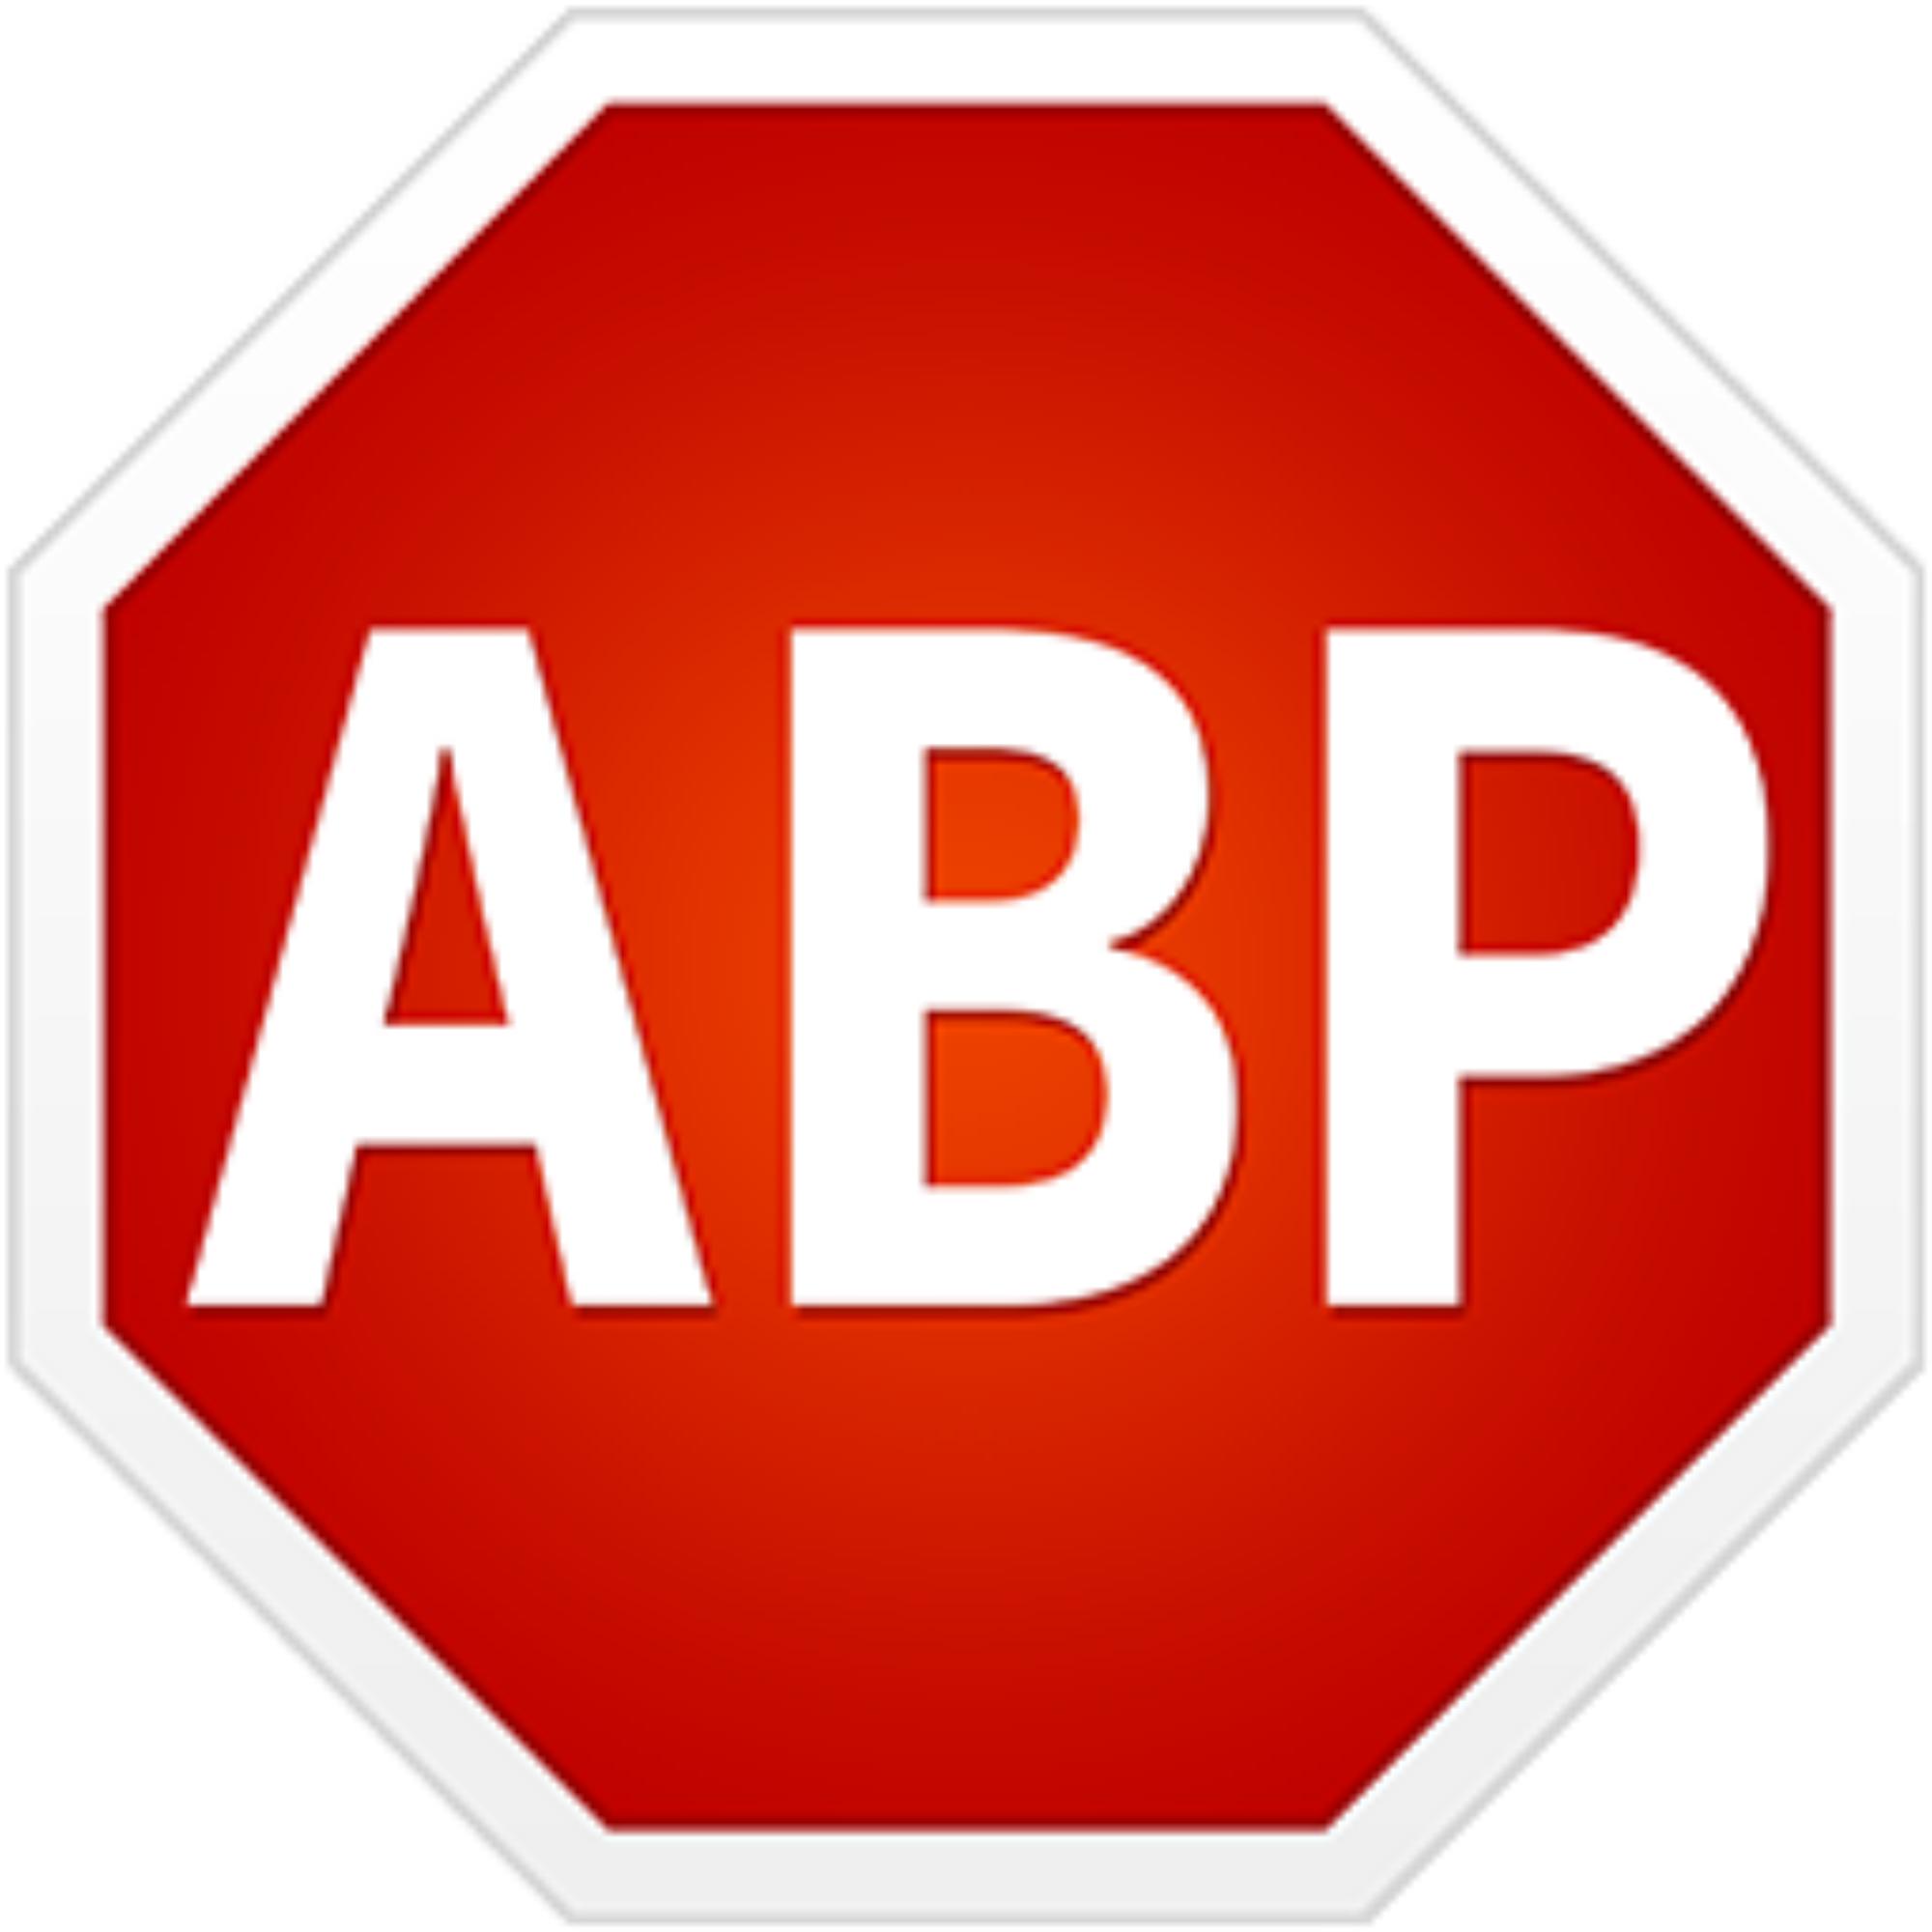 Advertisement clipart status update Stop Ad Clip Download Art